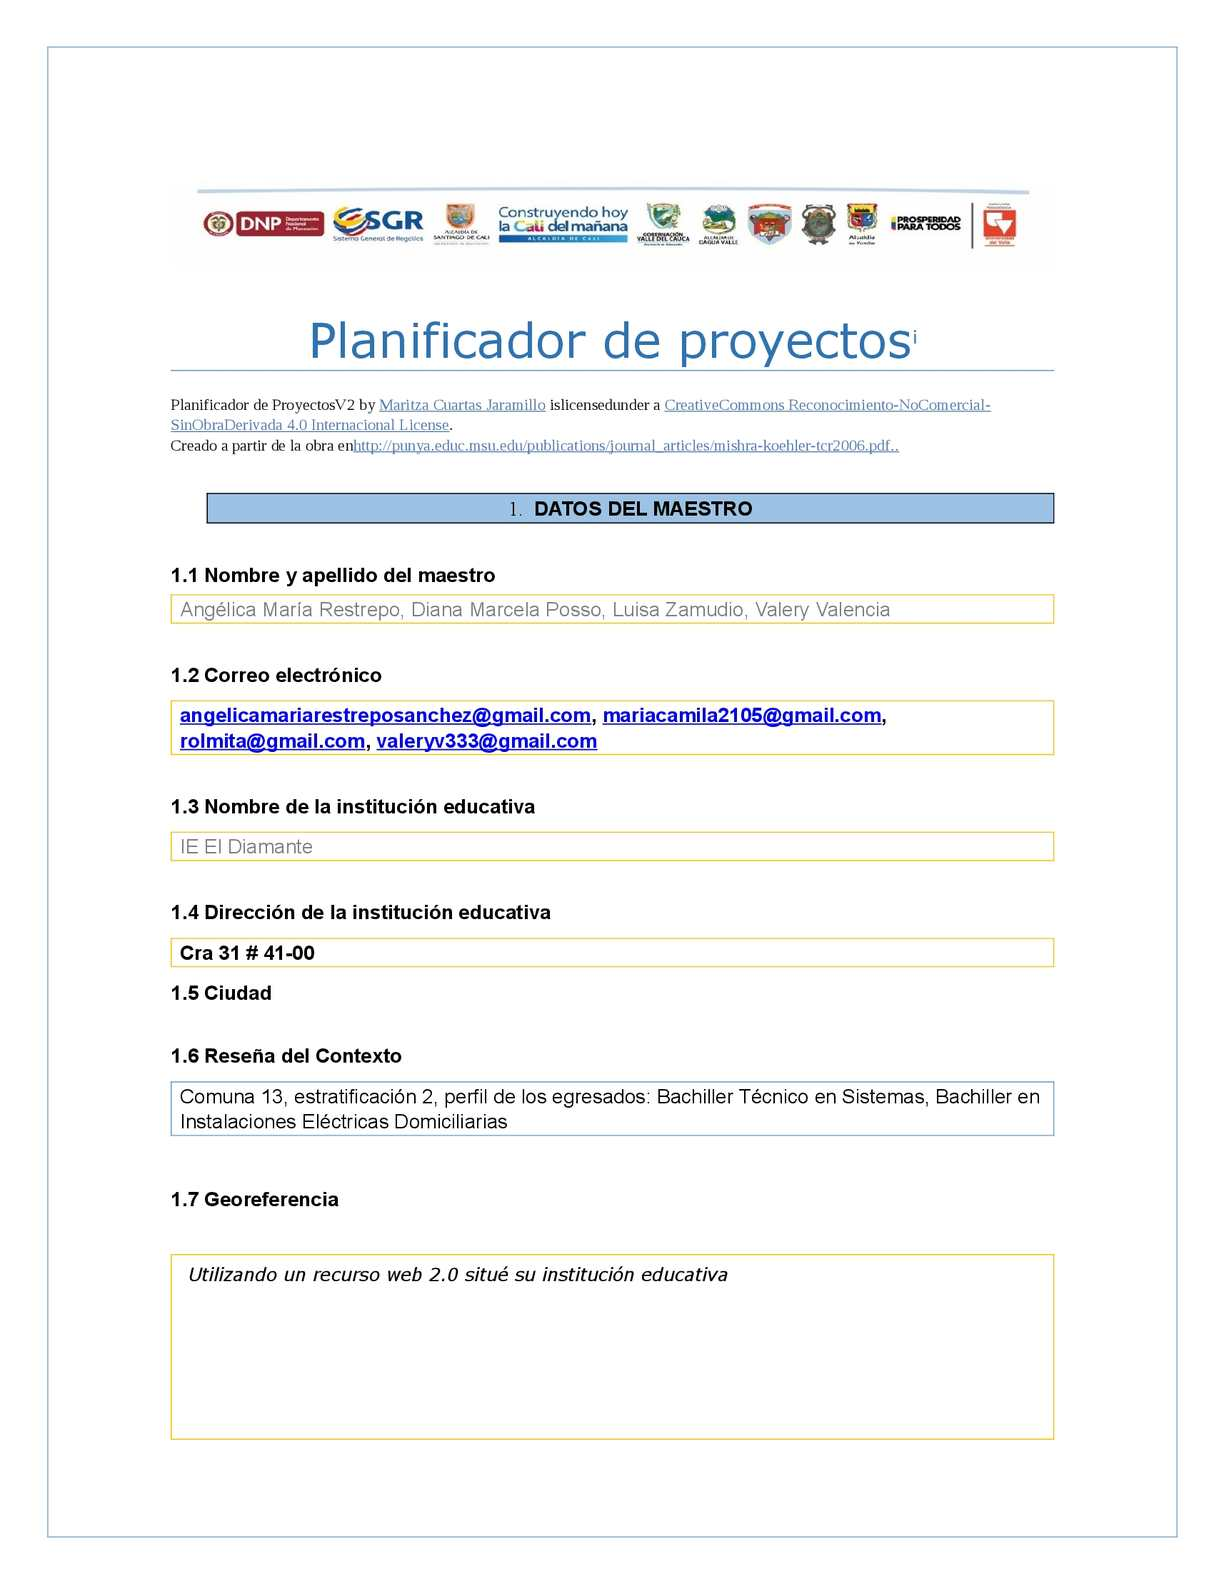 Calaméo - Planificador De Proyectos Plantilla